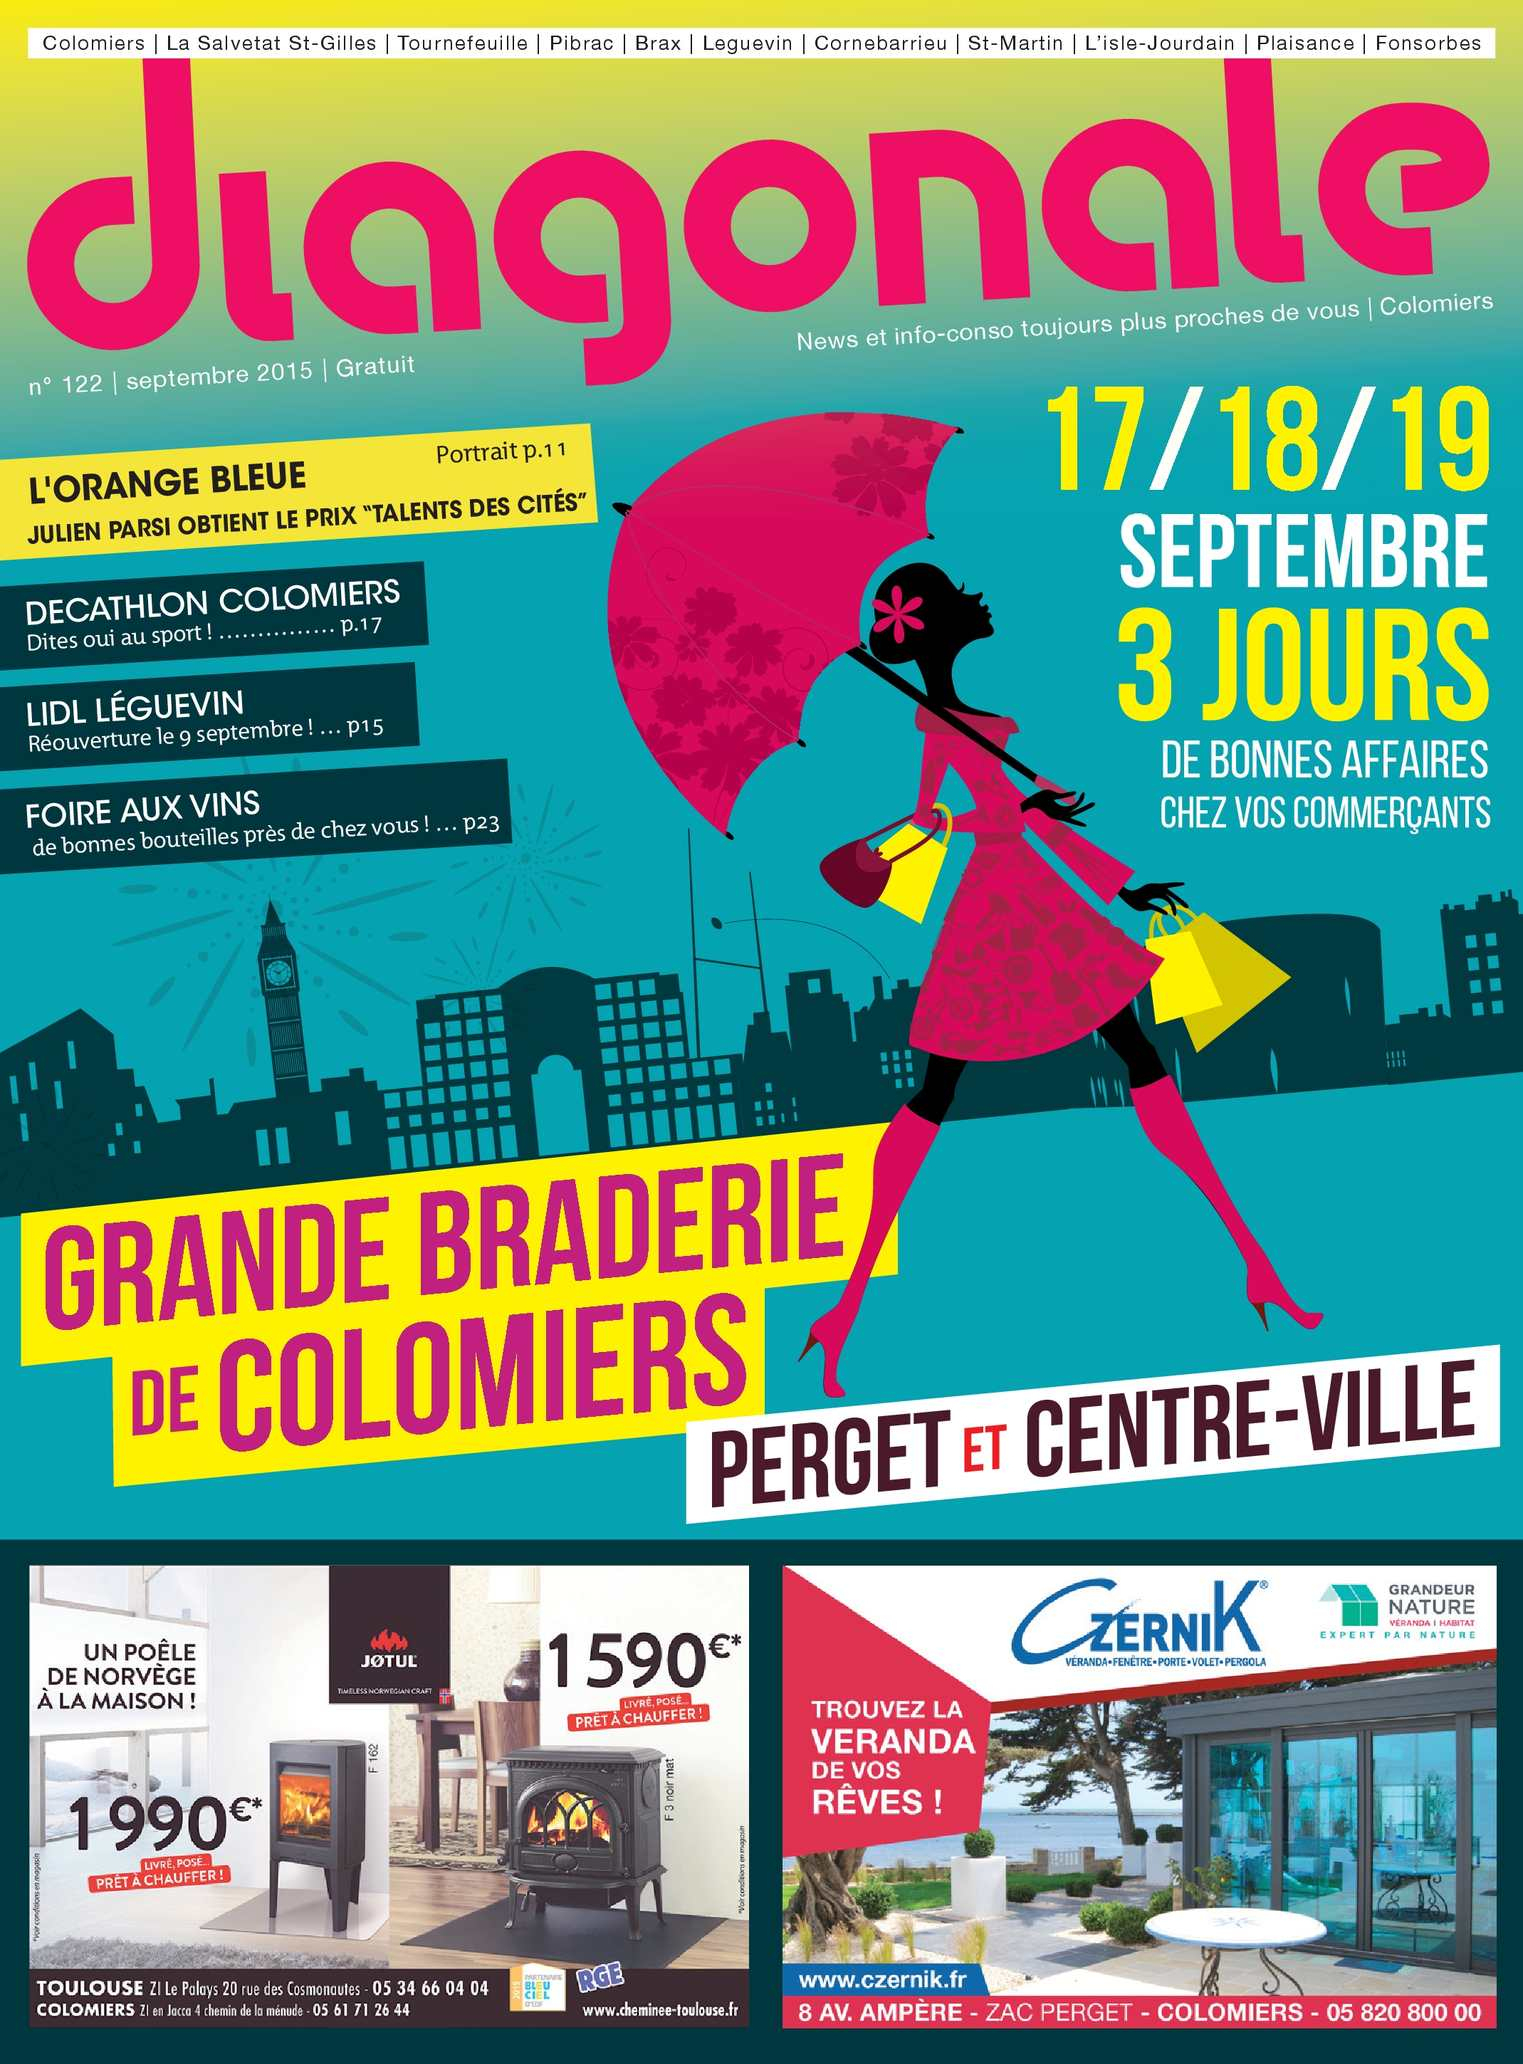 Calaméo - Diagonale Septembre 2015 - Spécial Grande Braderie ... avec Colomiers Piscine